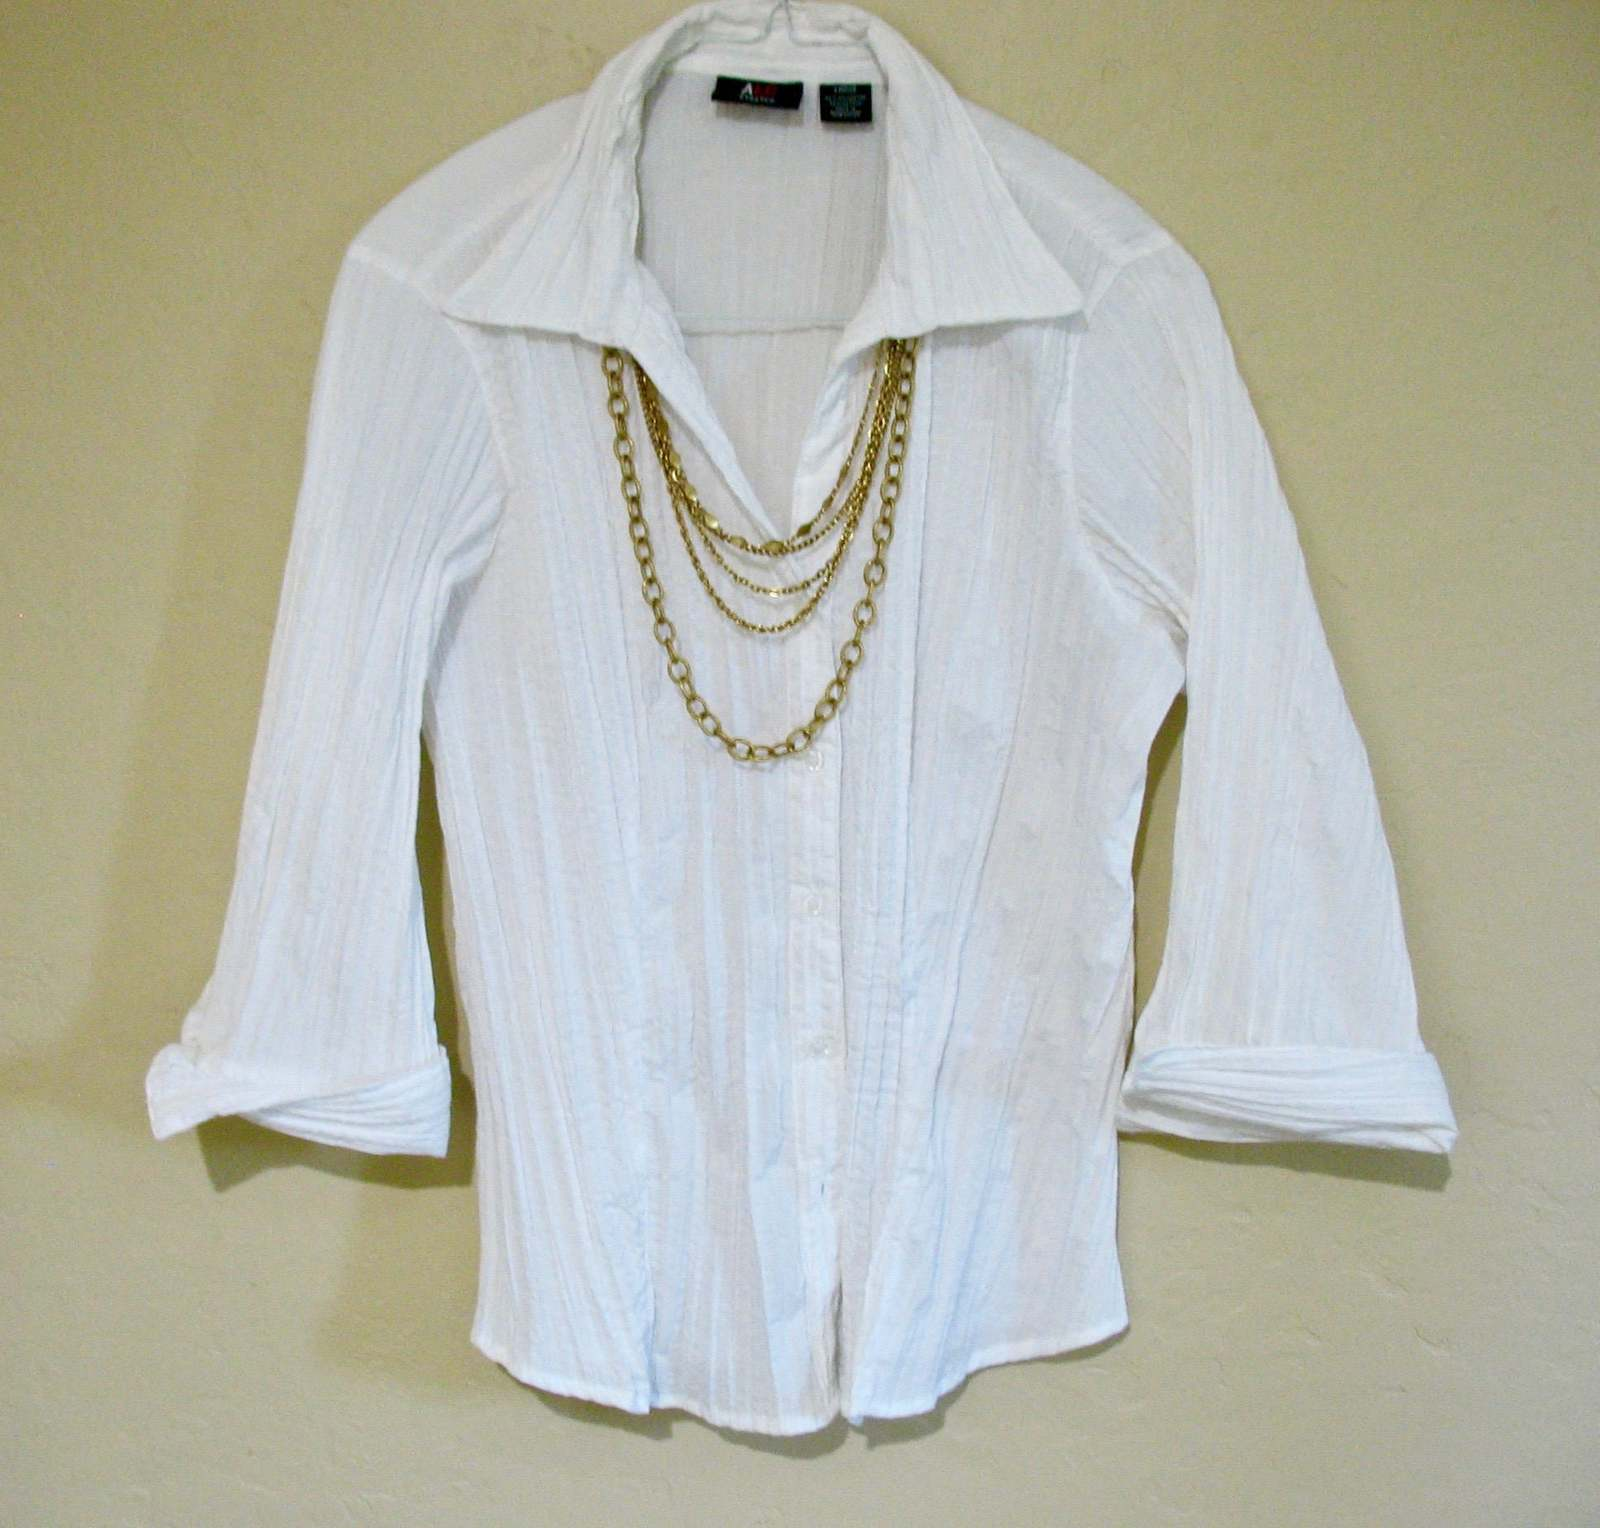 Multiple Chain Necklace, Multi Chains, Five Strands, 1970's, Gold Tone, Box Clas